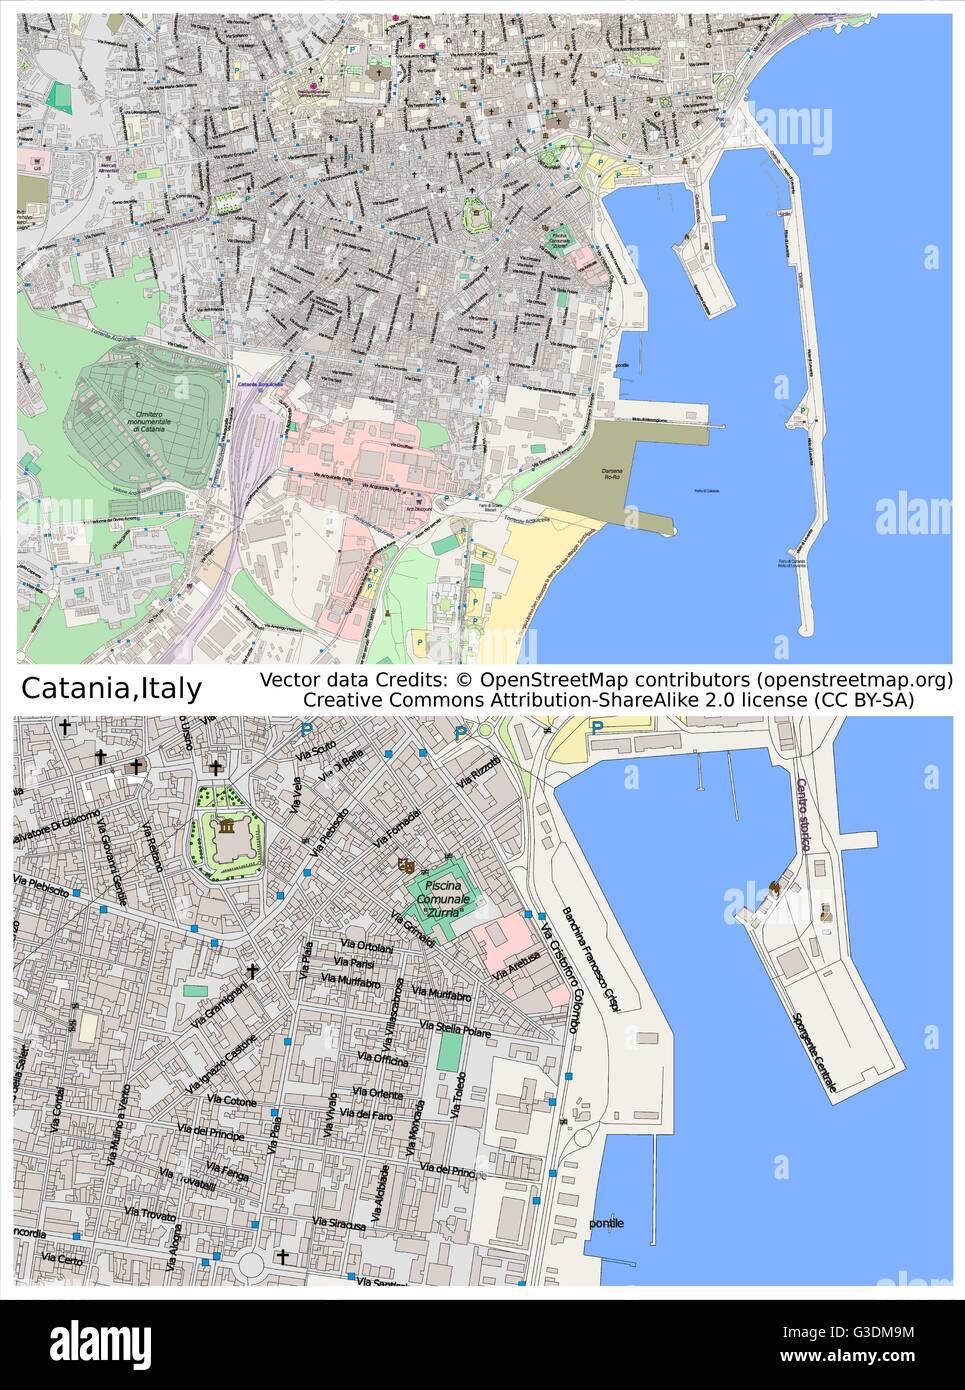 Catania Italy city map Stock Vector Art Illustration Vector Image